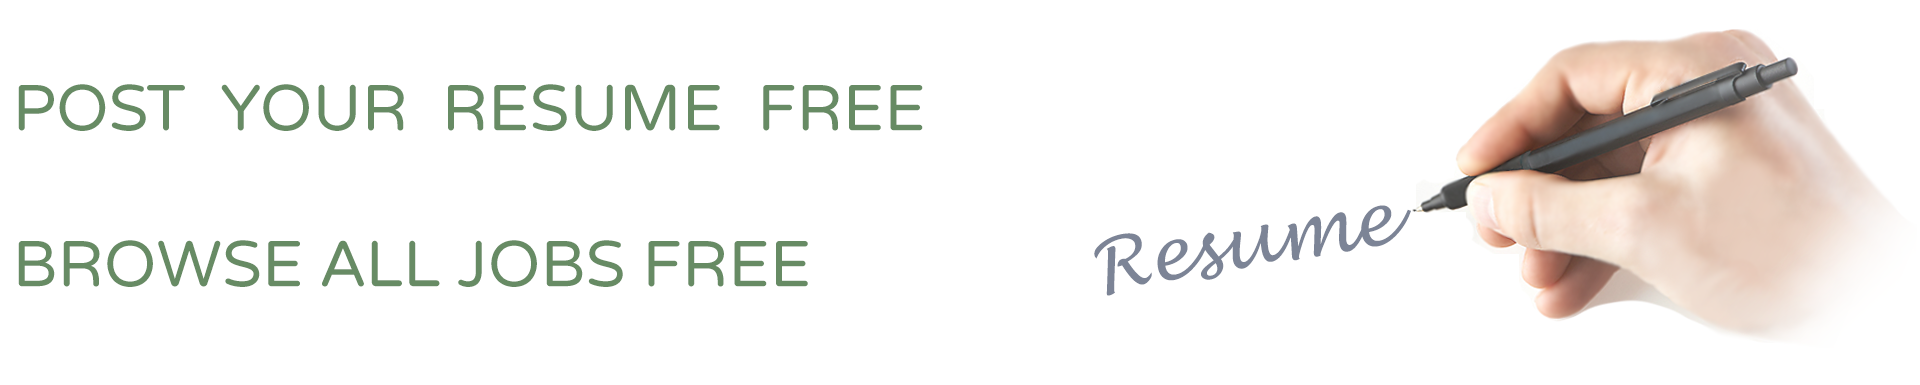 post resume free